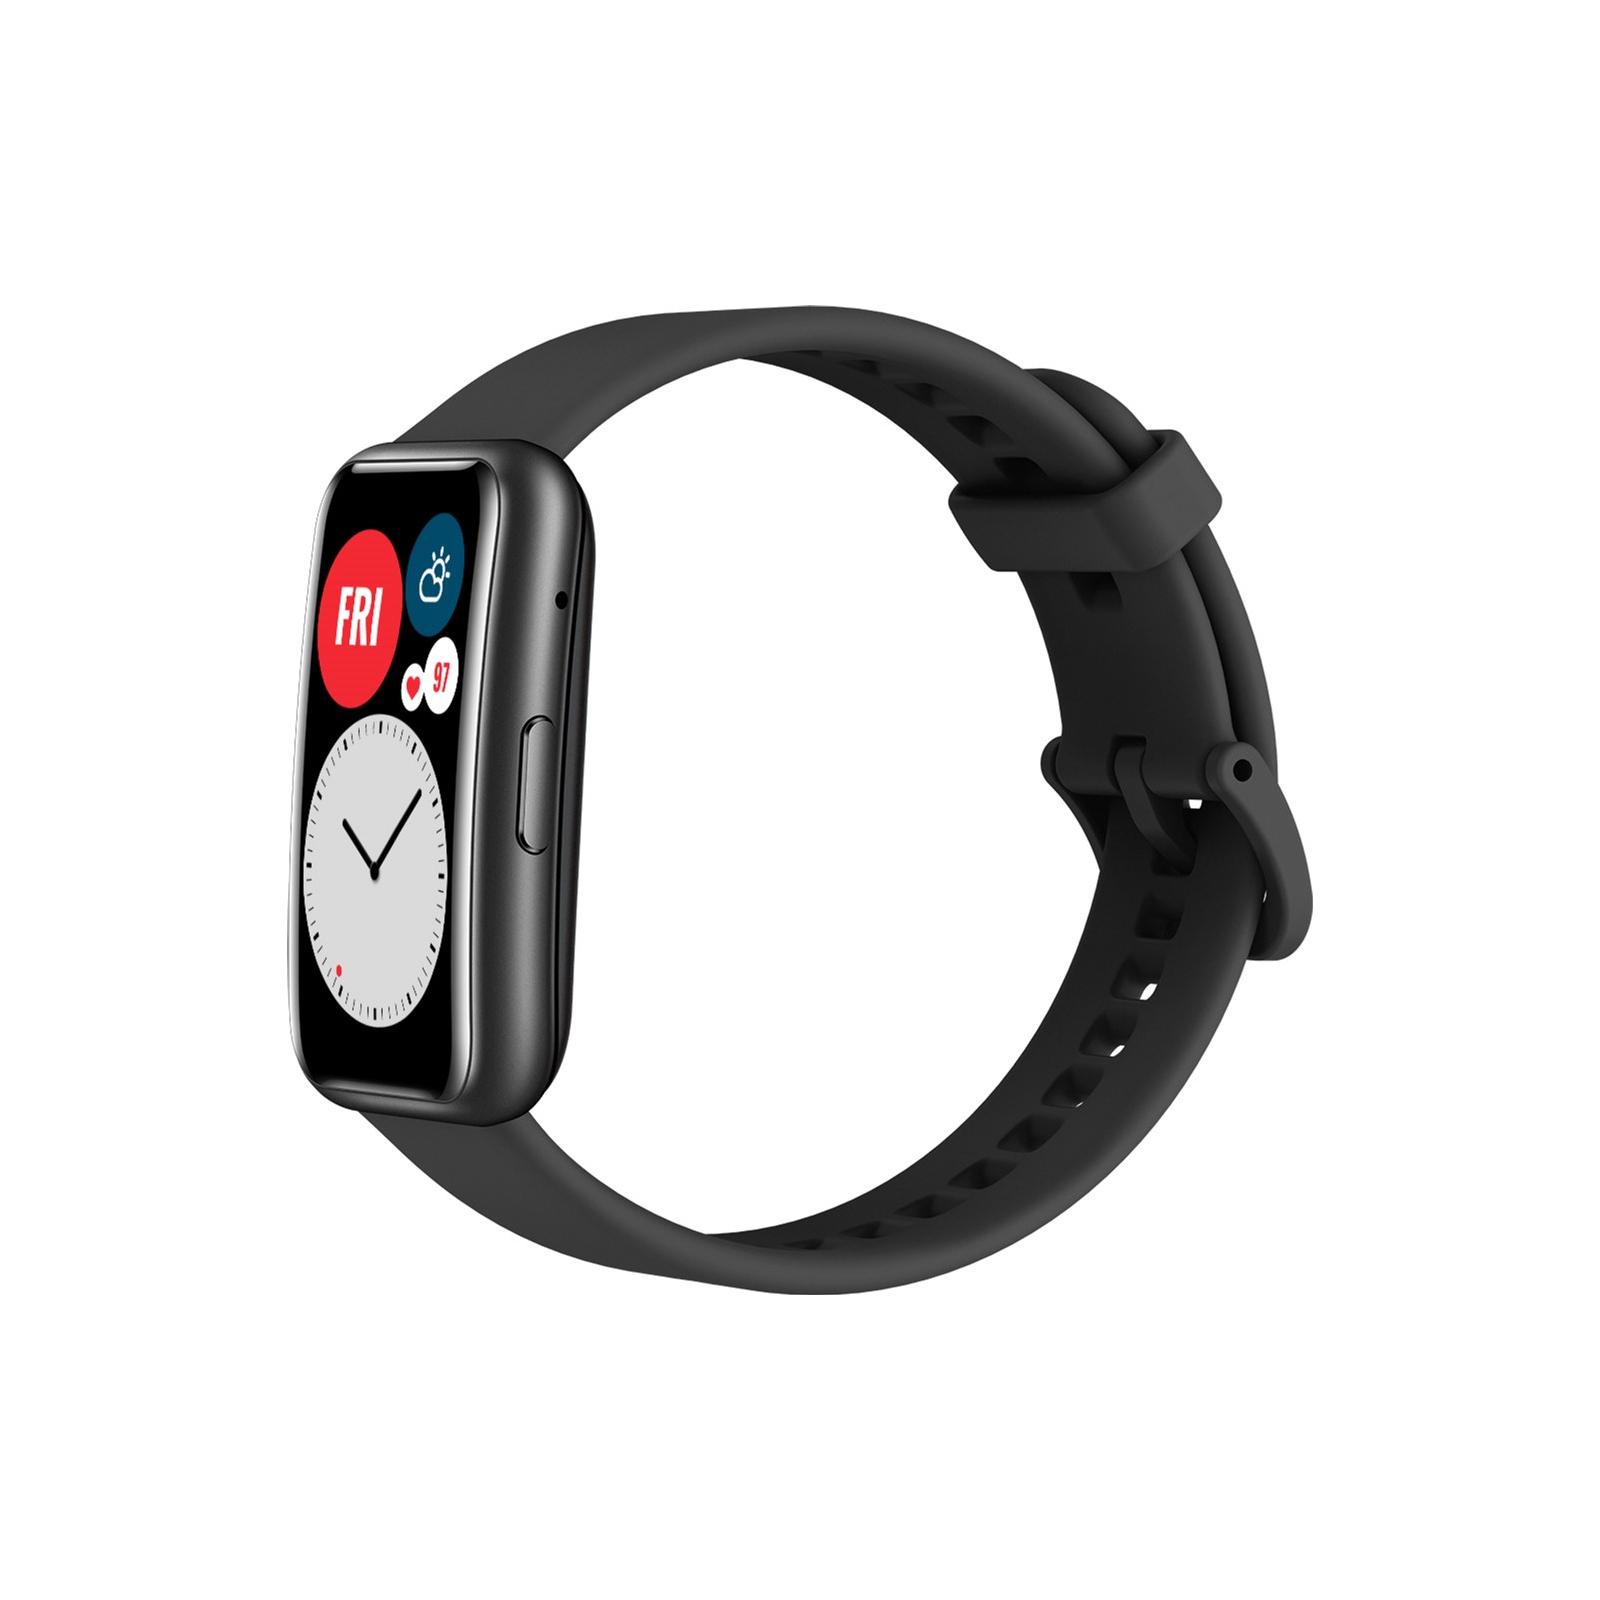 Смарт-годинник Huawei Watch Fit Graphite Black (55025871) зображення 7